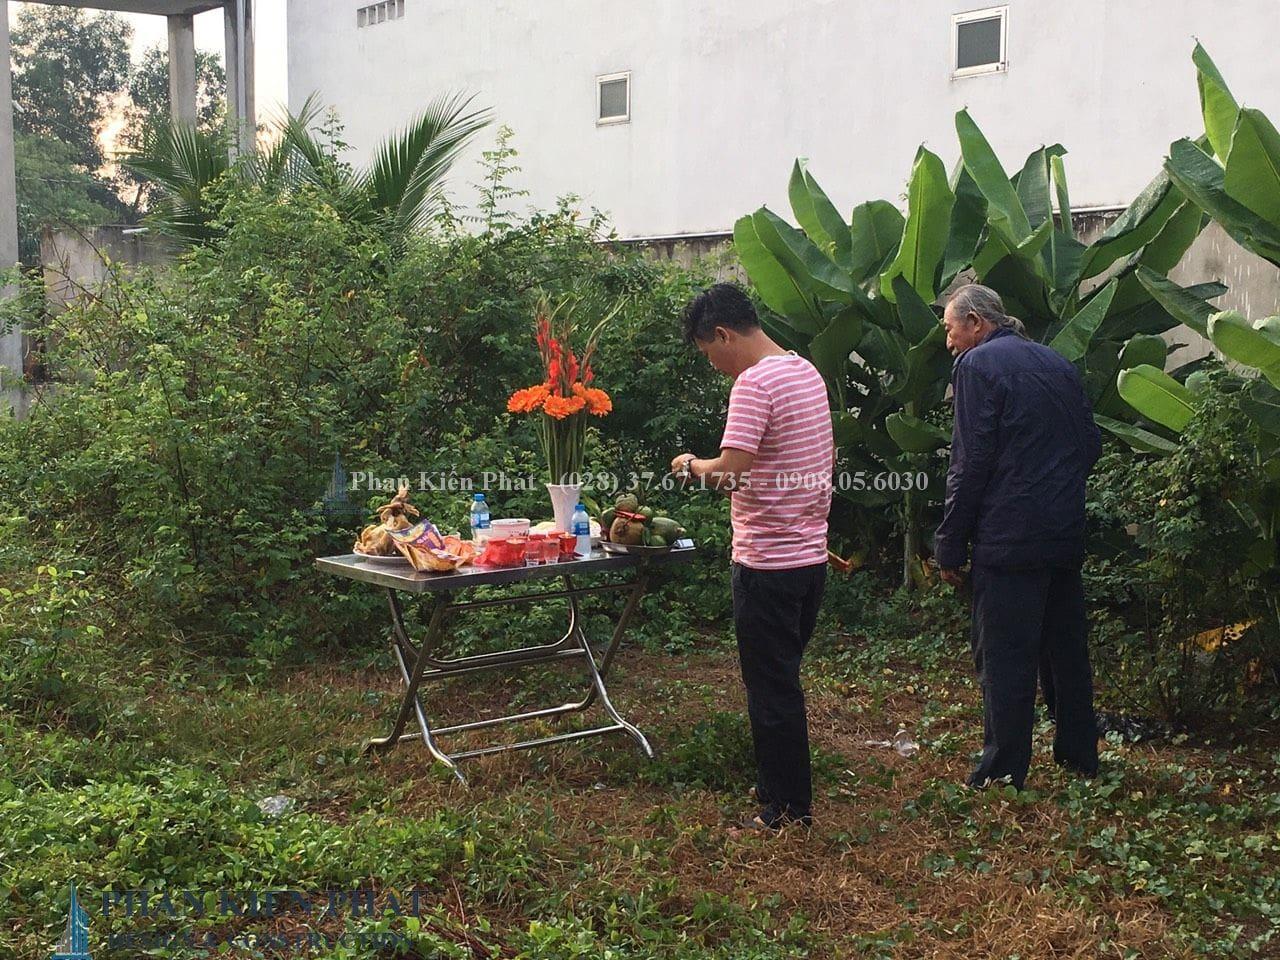 Cong Tac Cung Khoi Cong Biet Thu Vuon V1